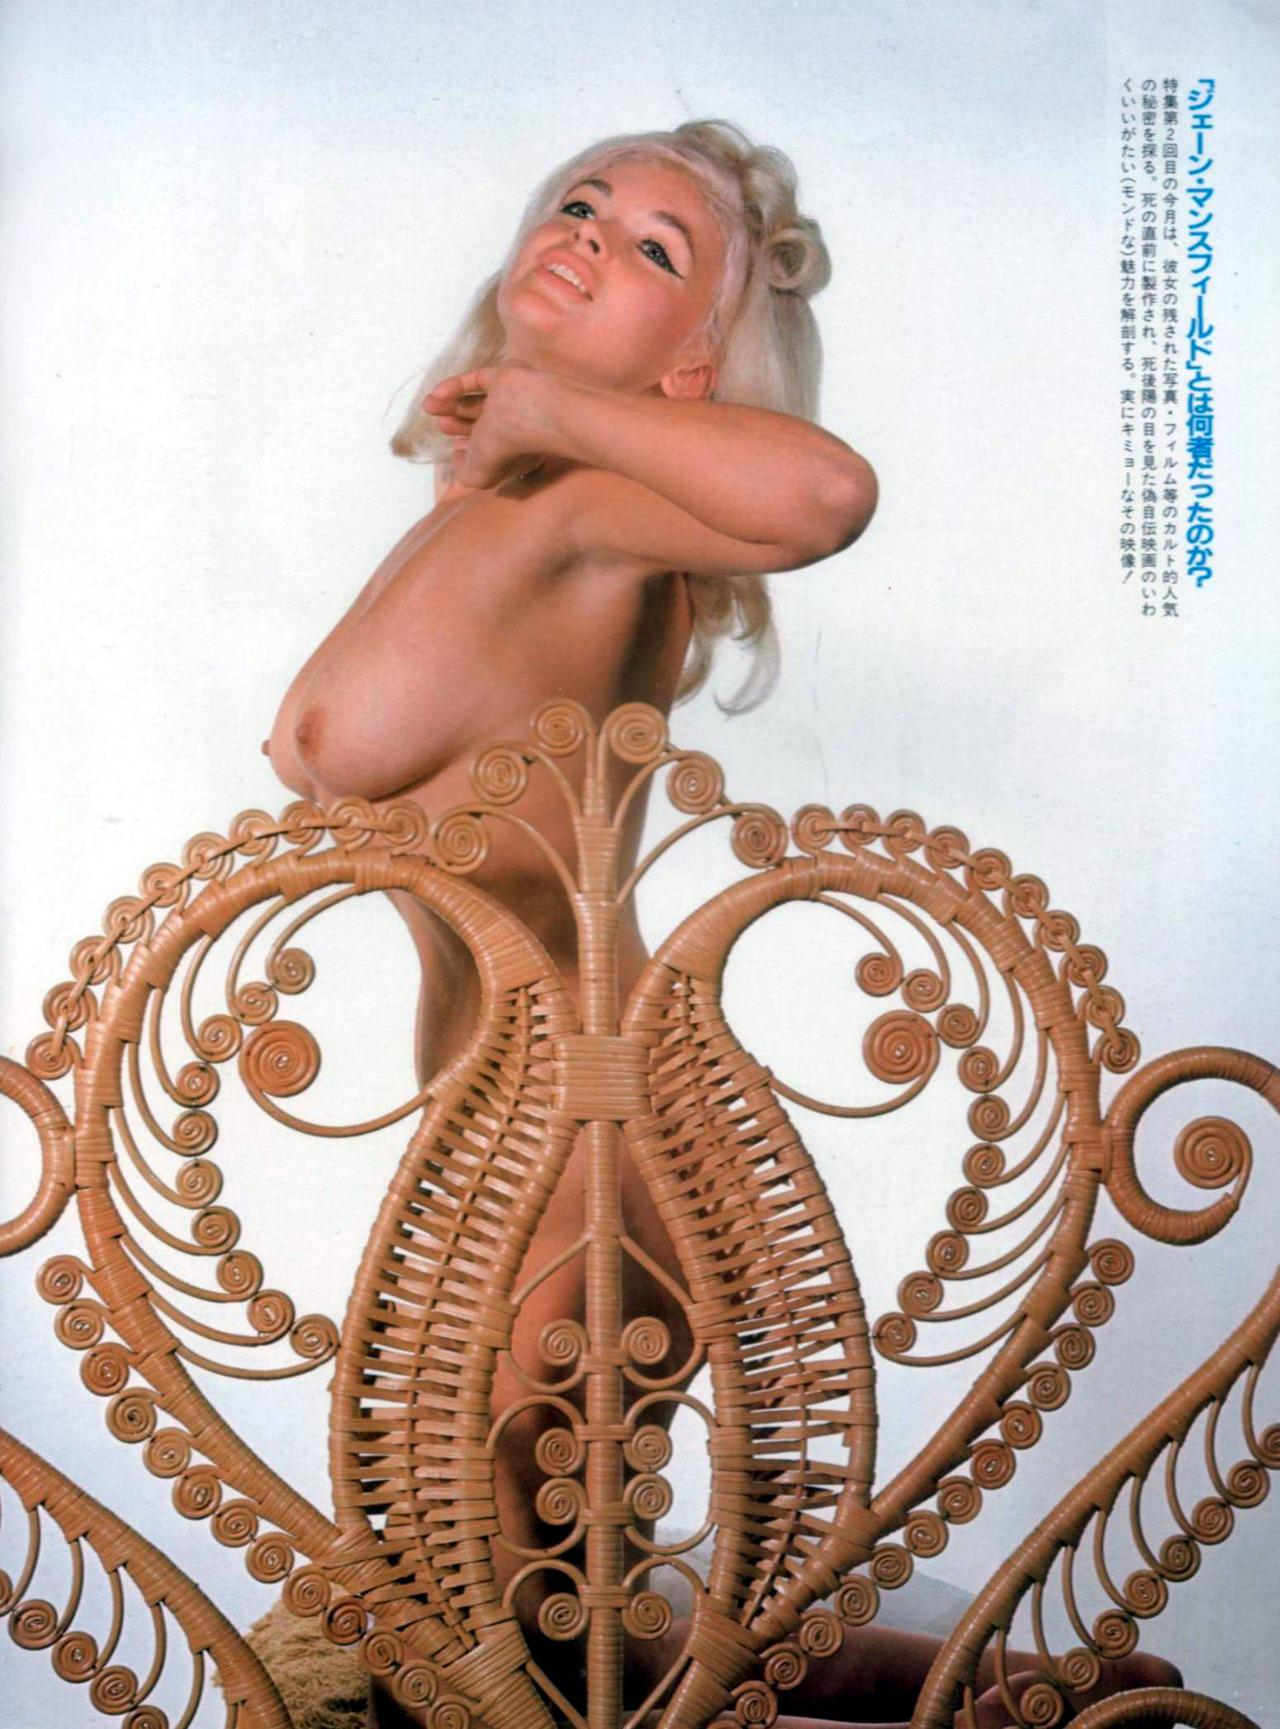 85 best Nudes images on Pinterest